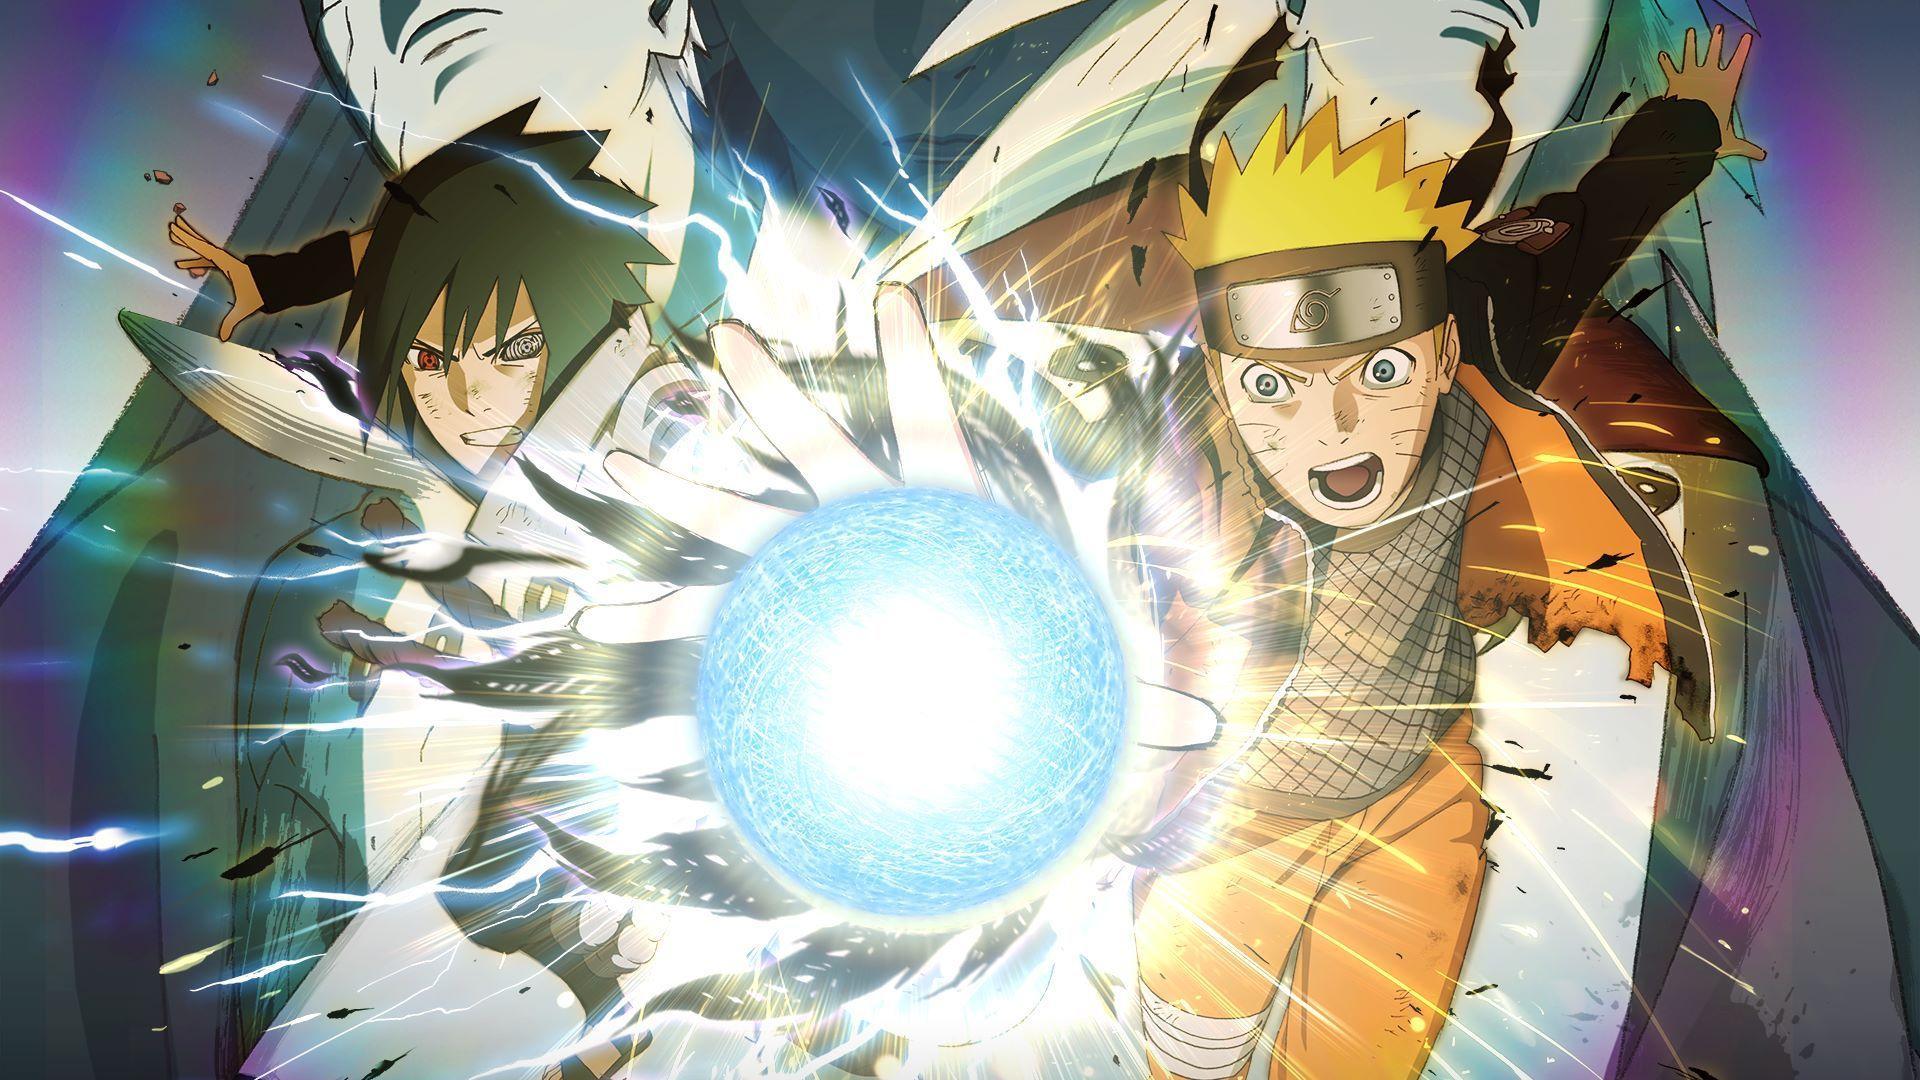 Naruto Xbox Wallpapers Top Free Naruto Xbox Backgrounds